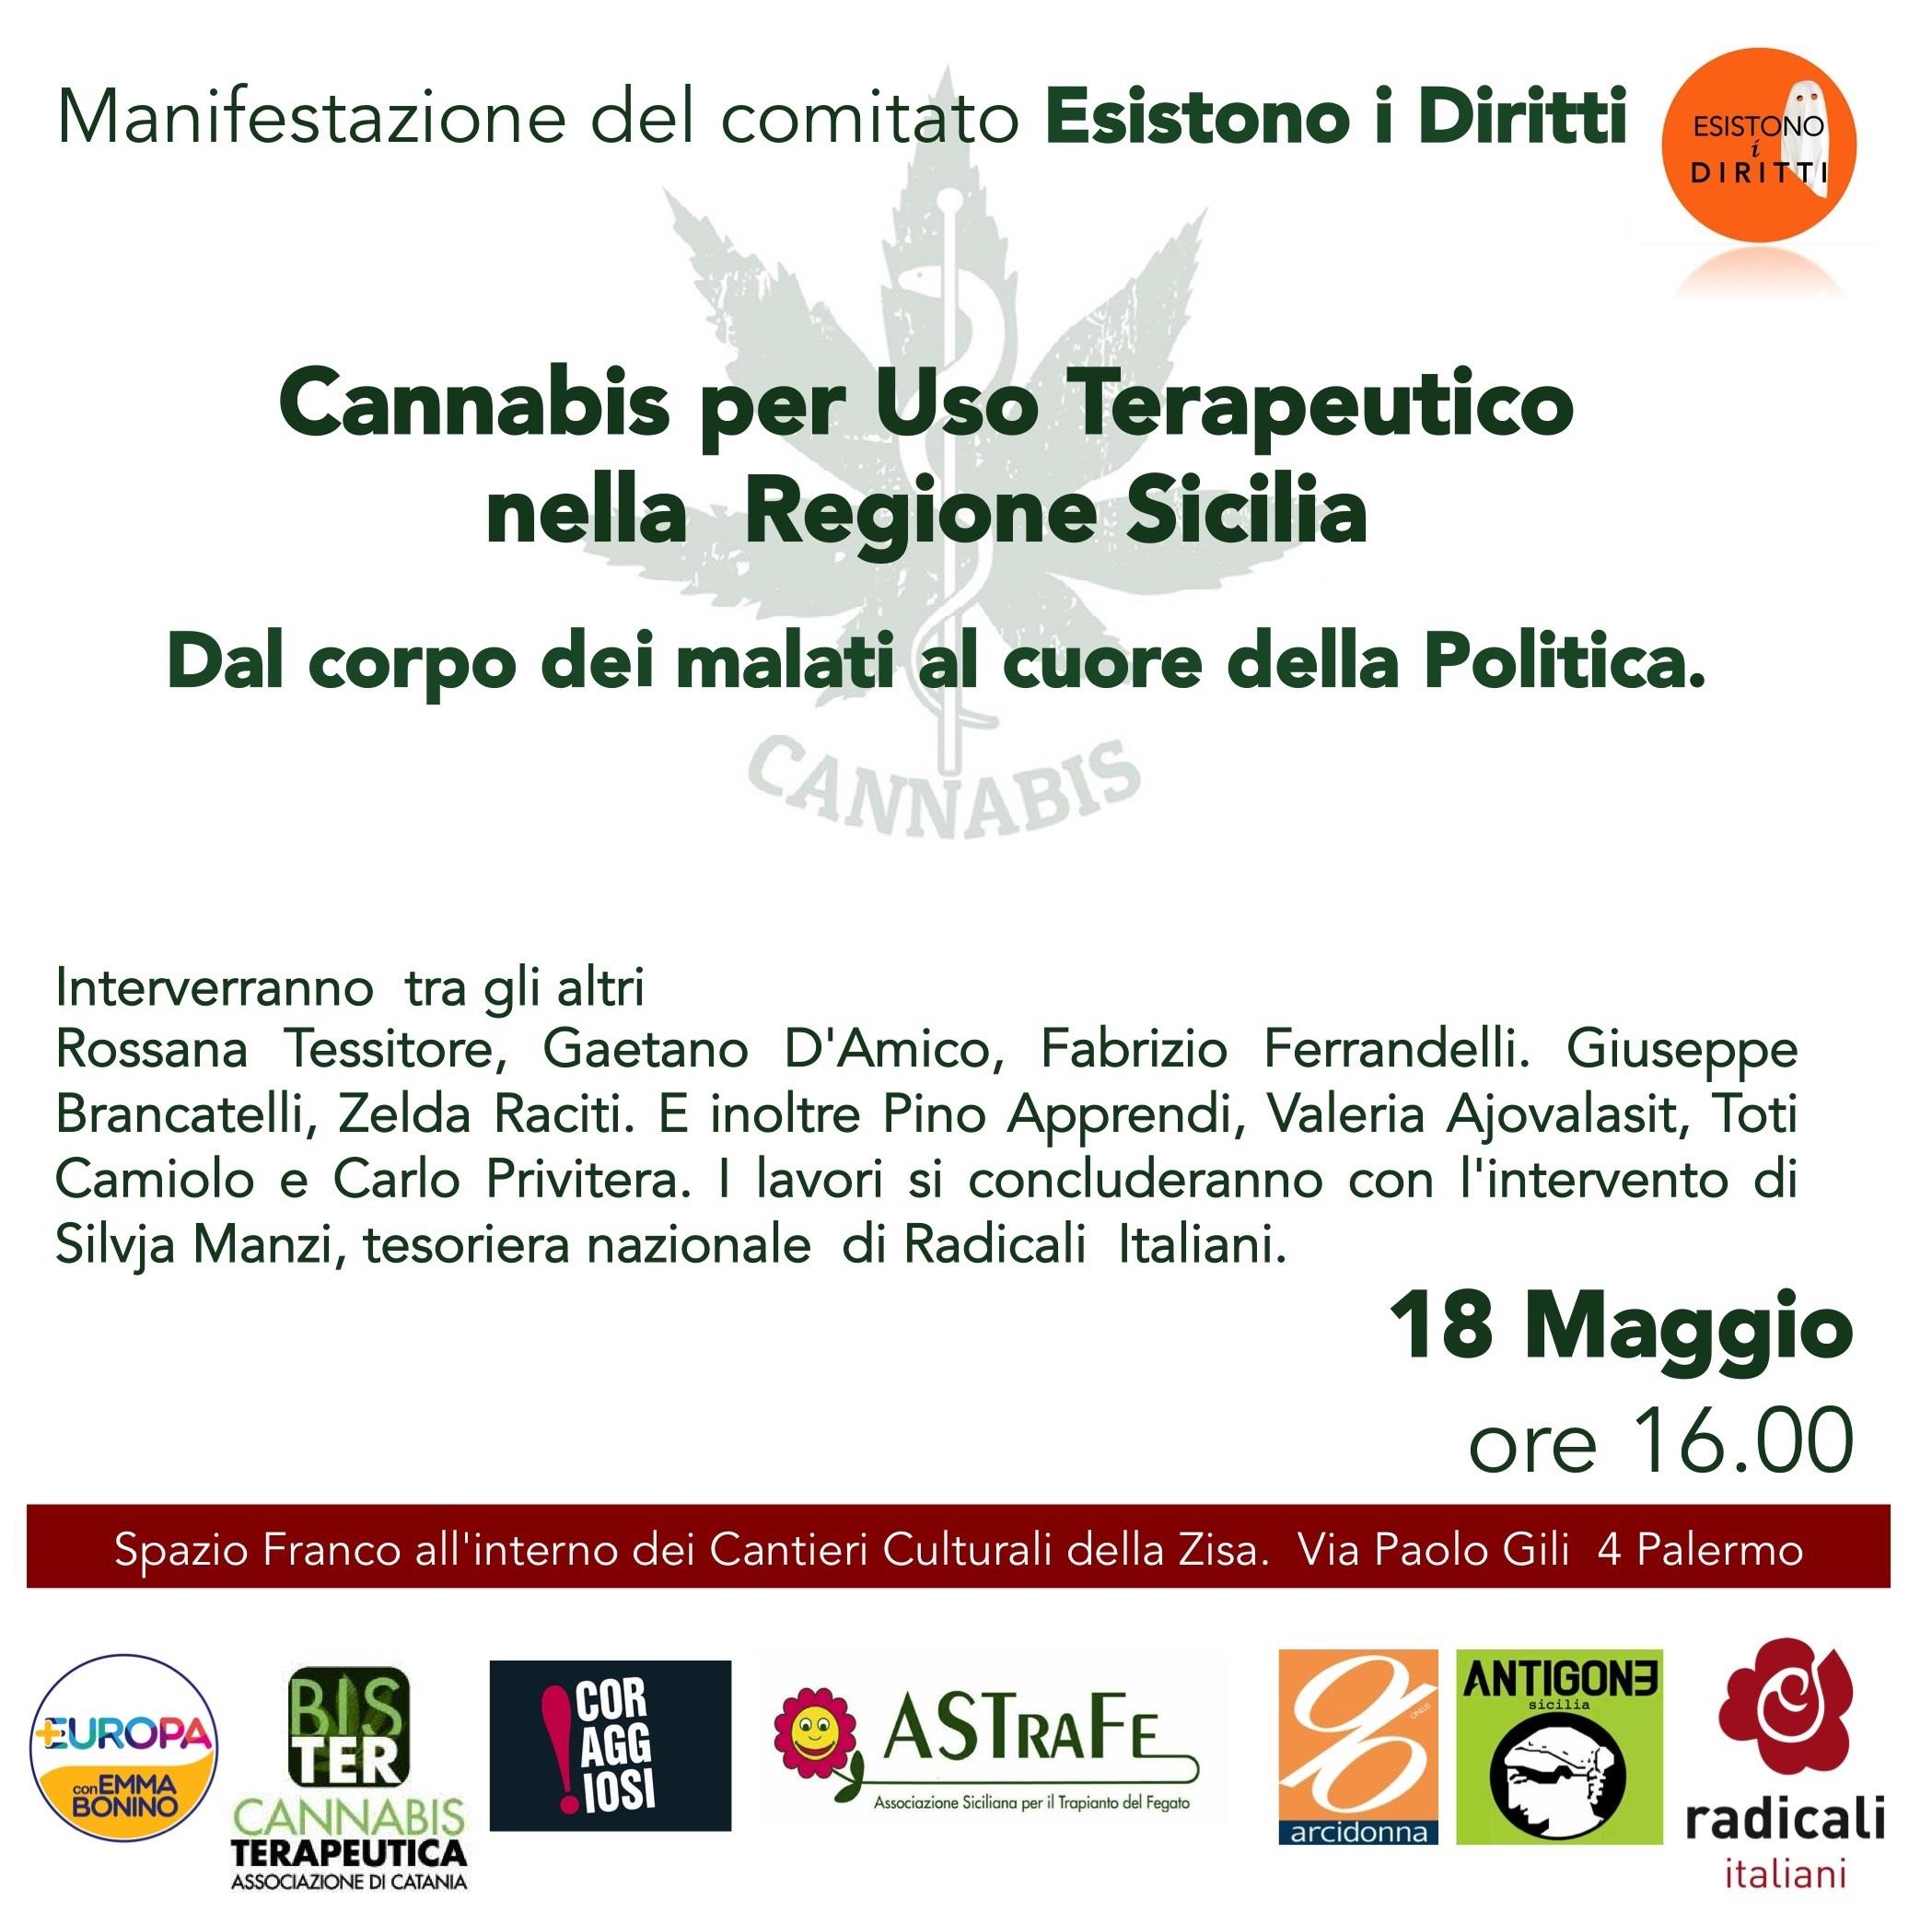 locandina cannabis 18_05_18 Palermo v02.jpg